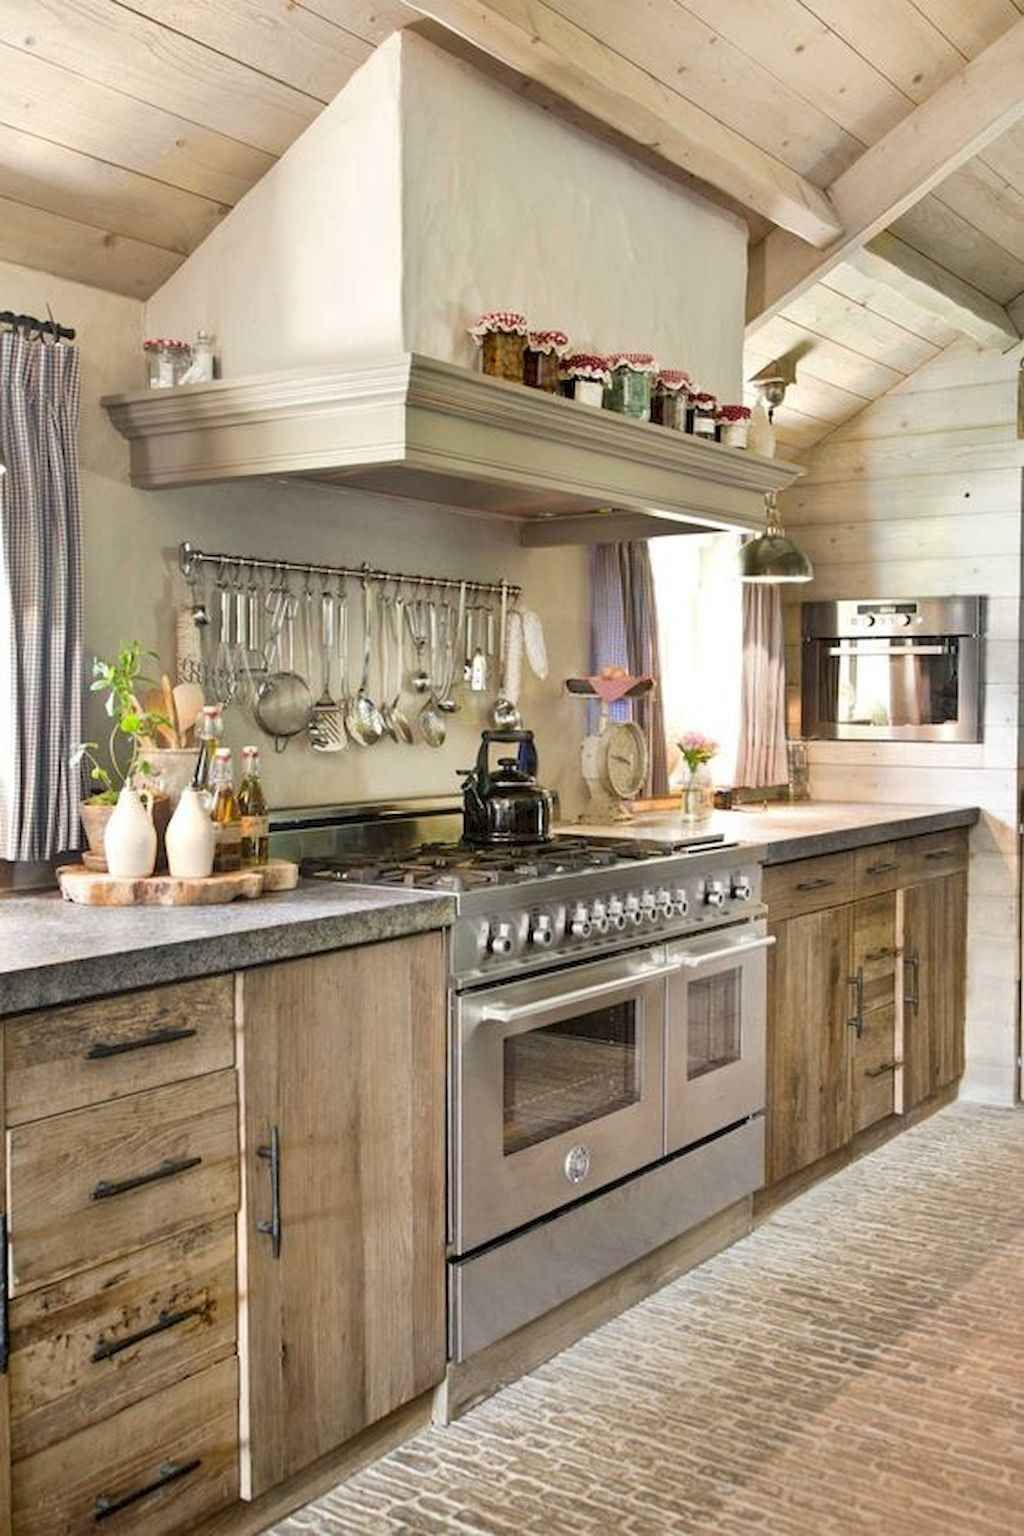 nice rustic farmhouse kitchen 2019 60 diy kitchen on extraordinary kitchen remodel ideas id=28911